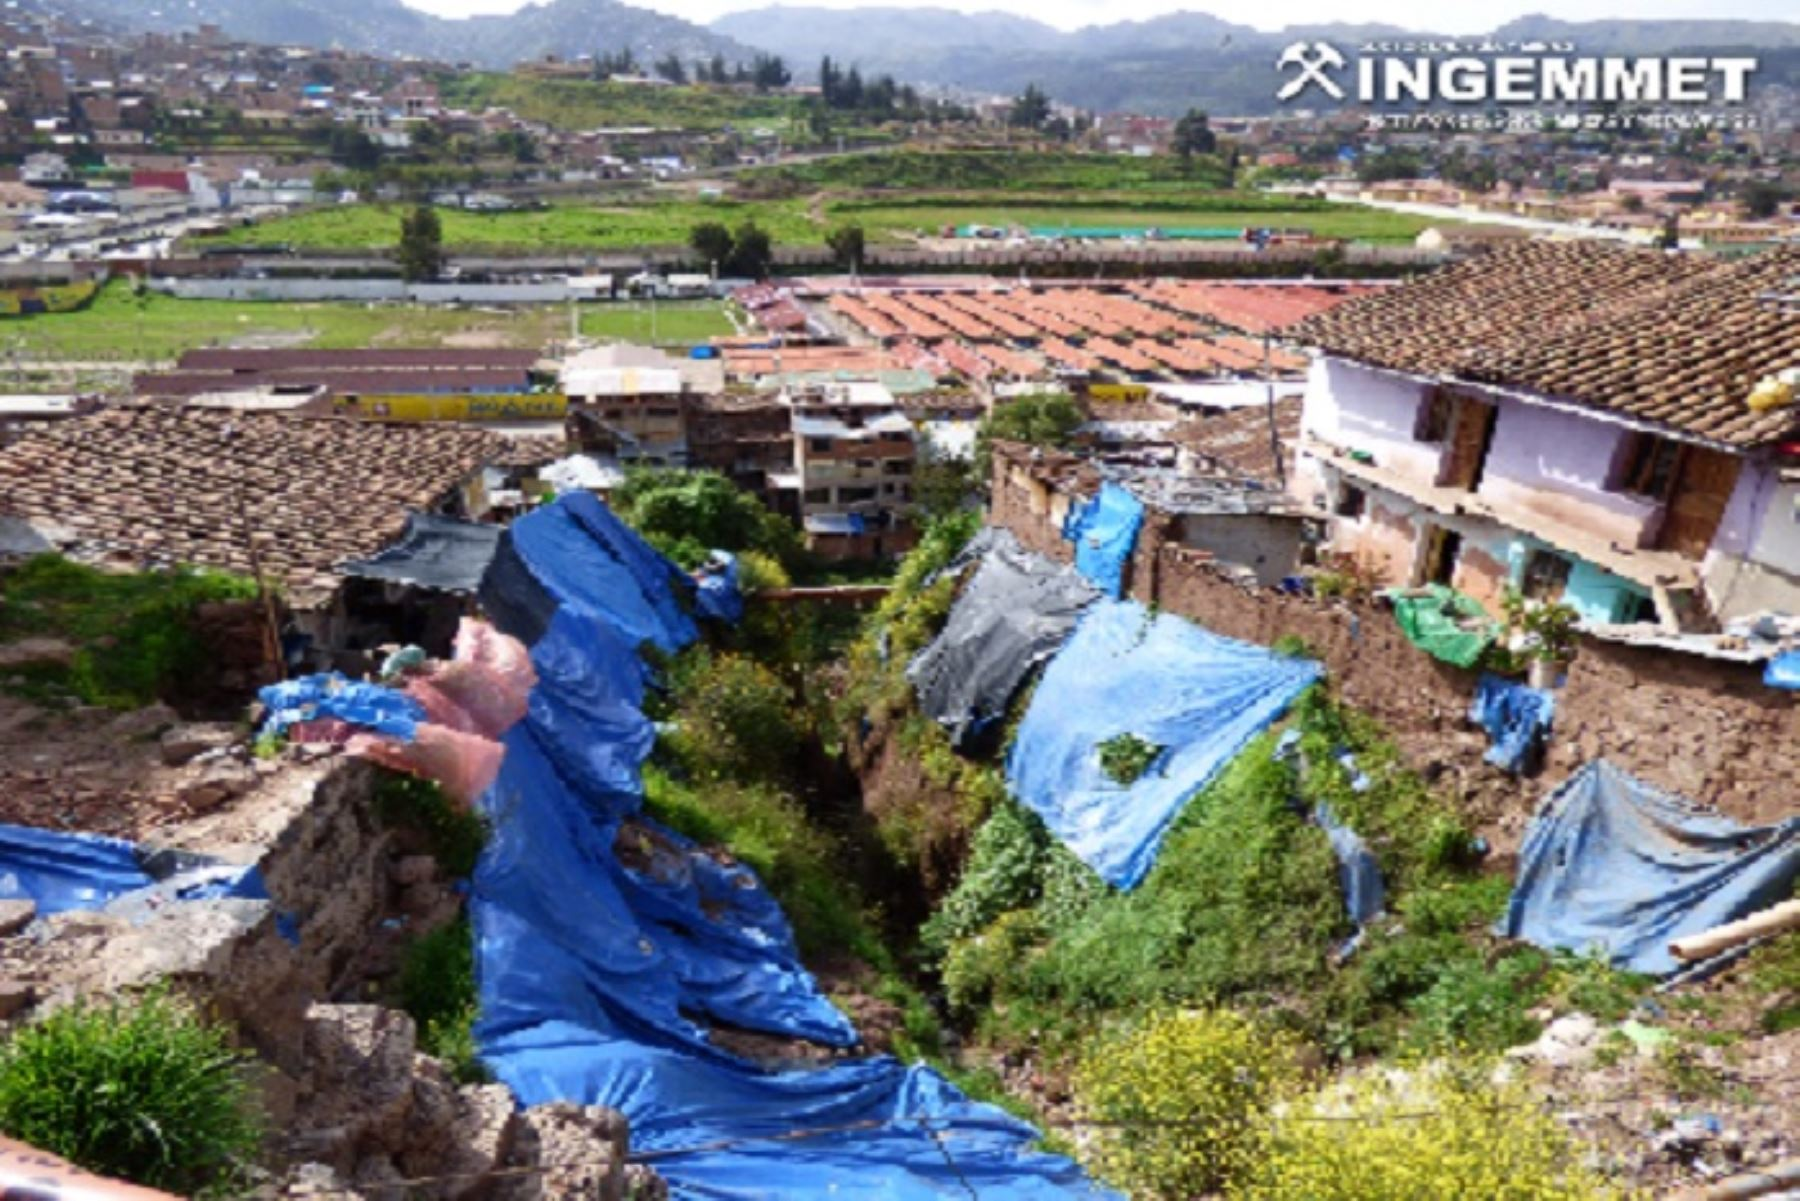 Ingemmet identifica 26 zonas críticas por peligros geológicos en Cusco